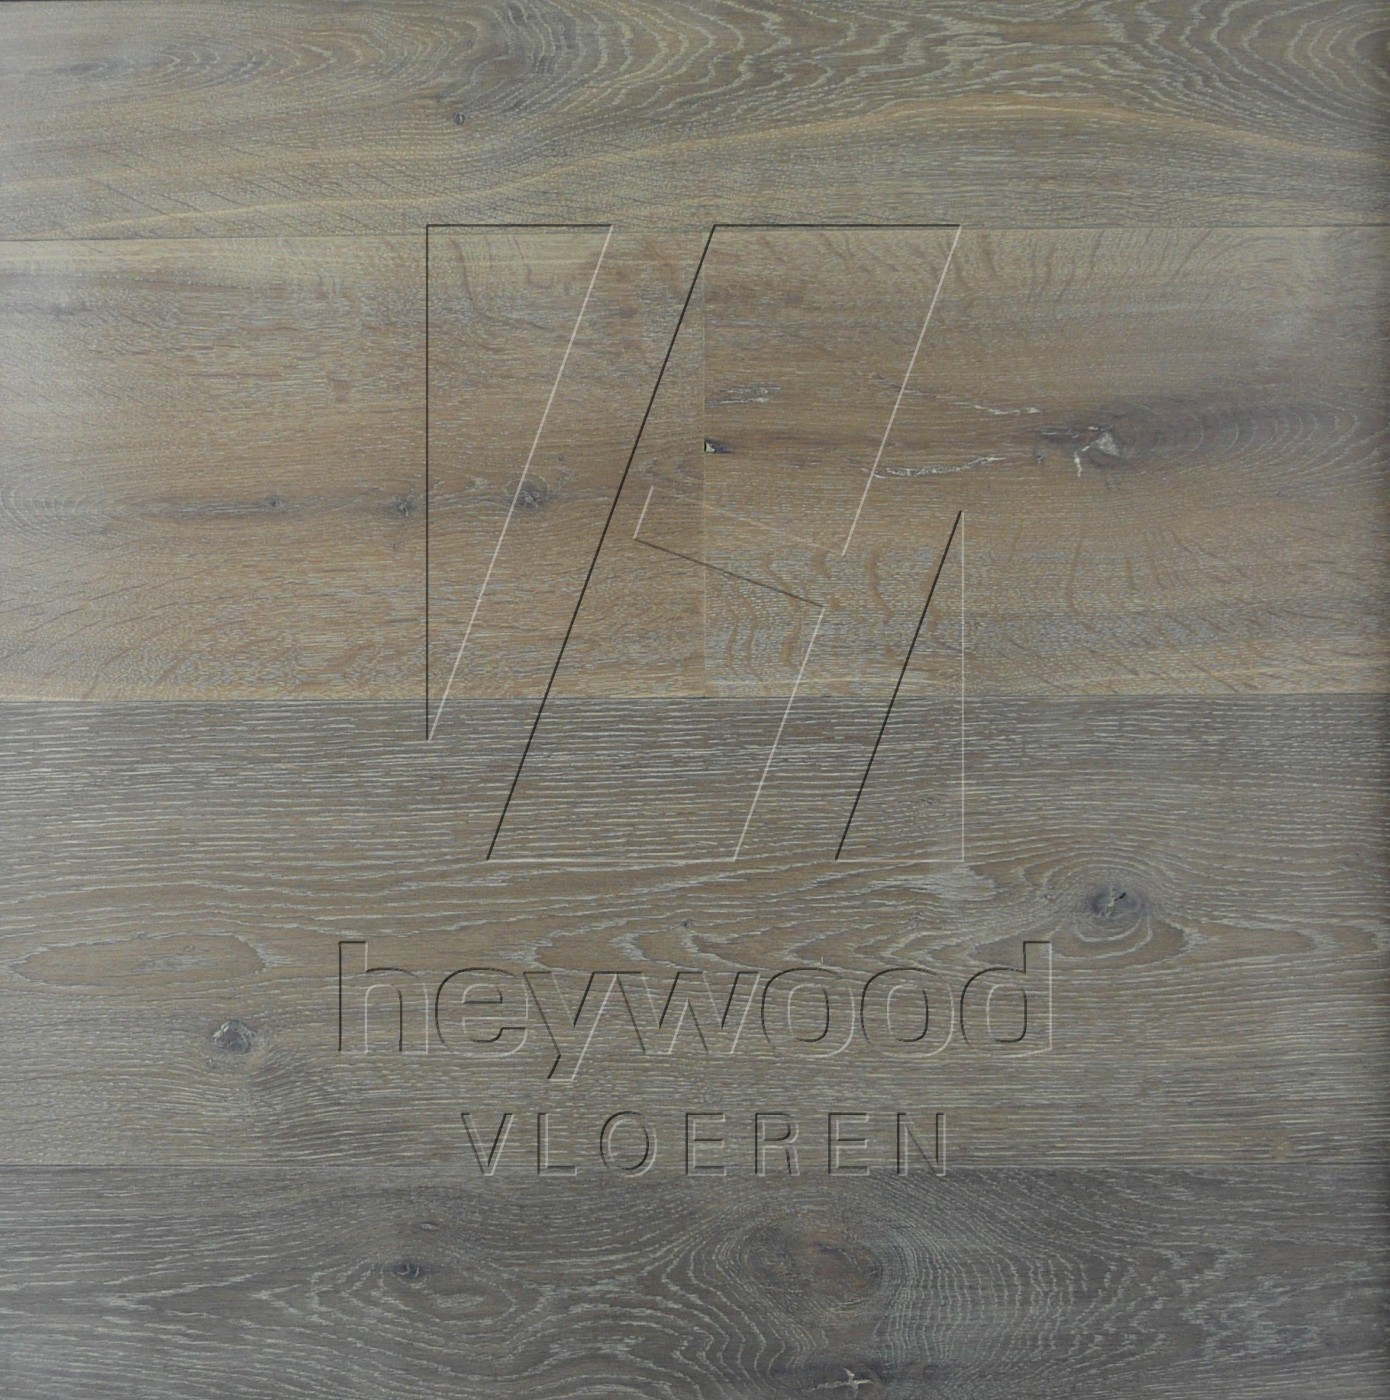 Montreal in European Oak Character of Bespoke Wooden Floors